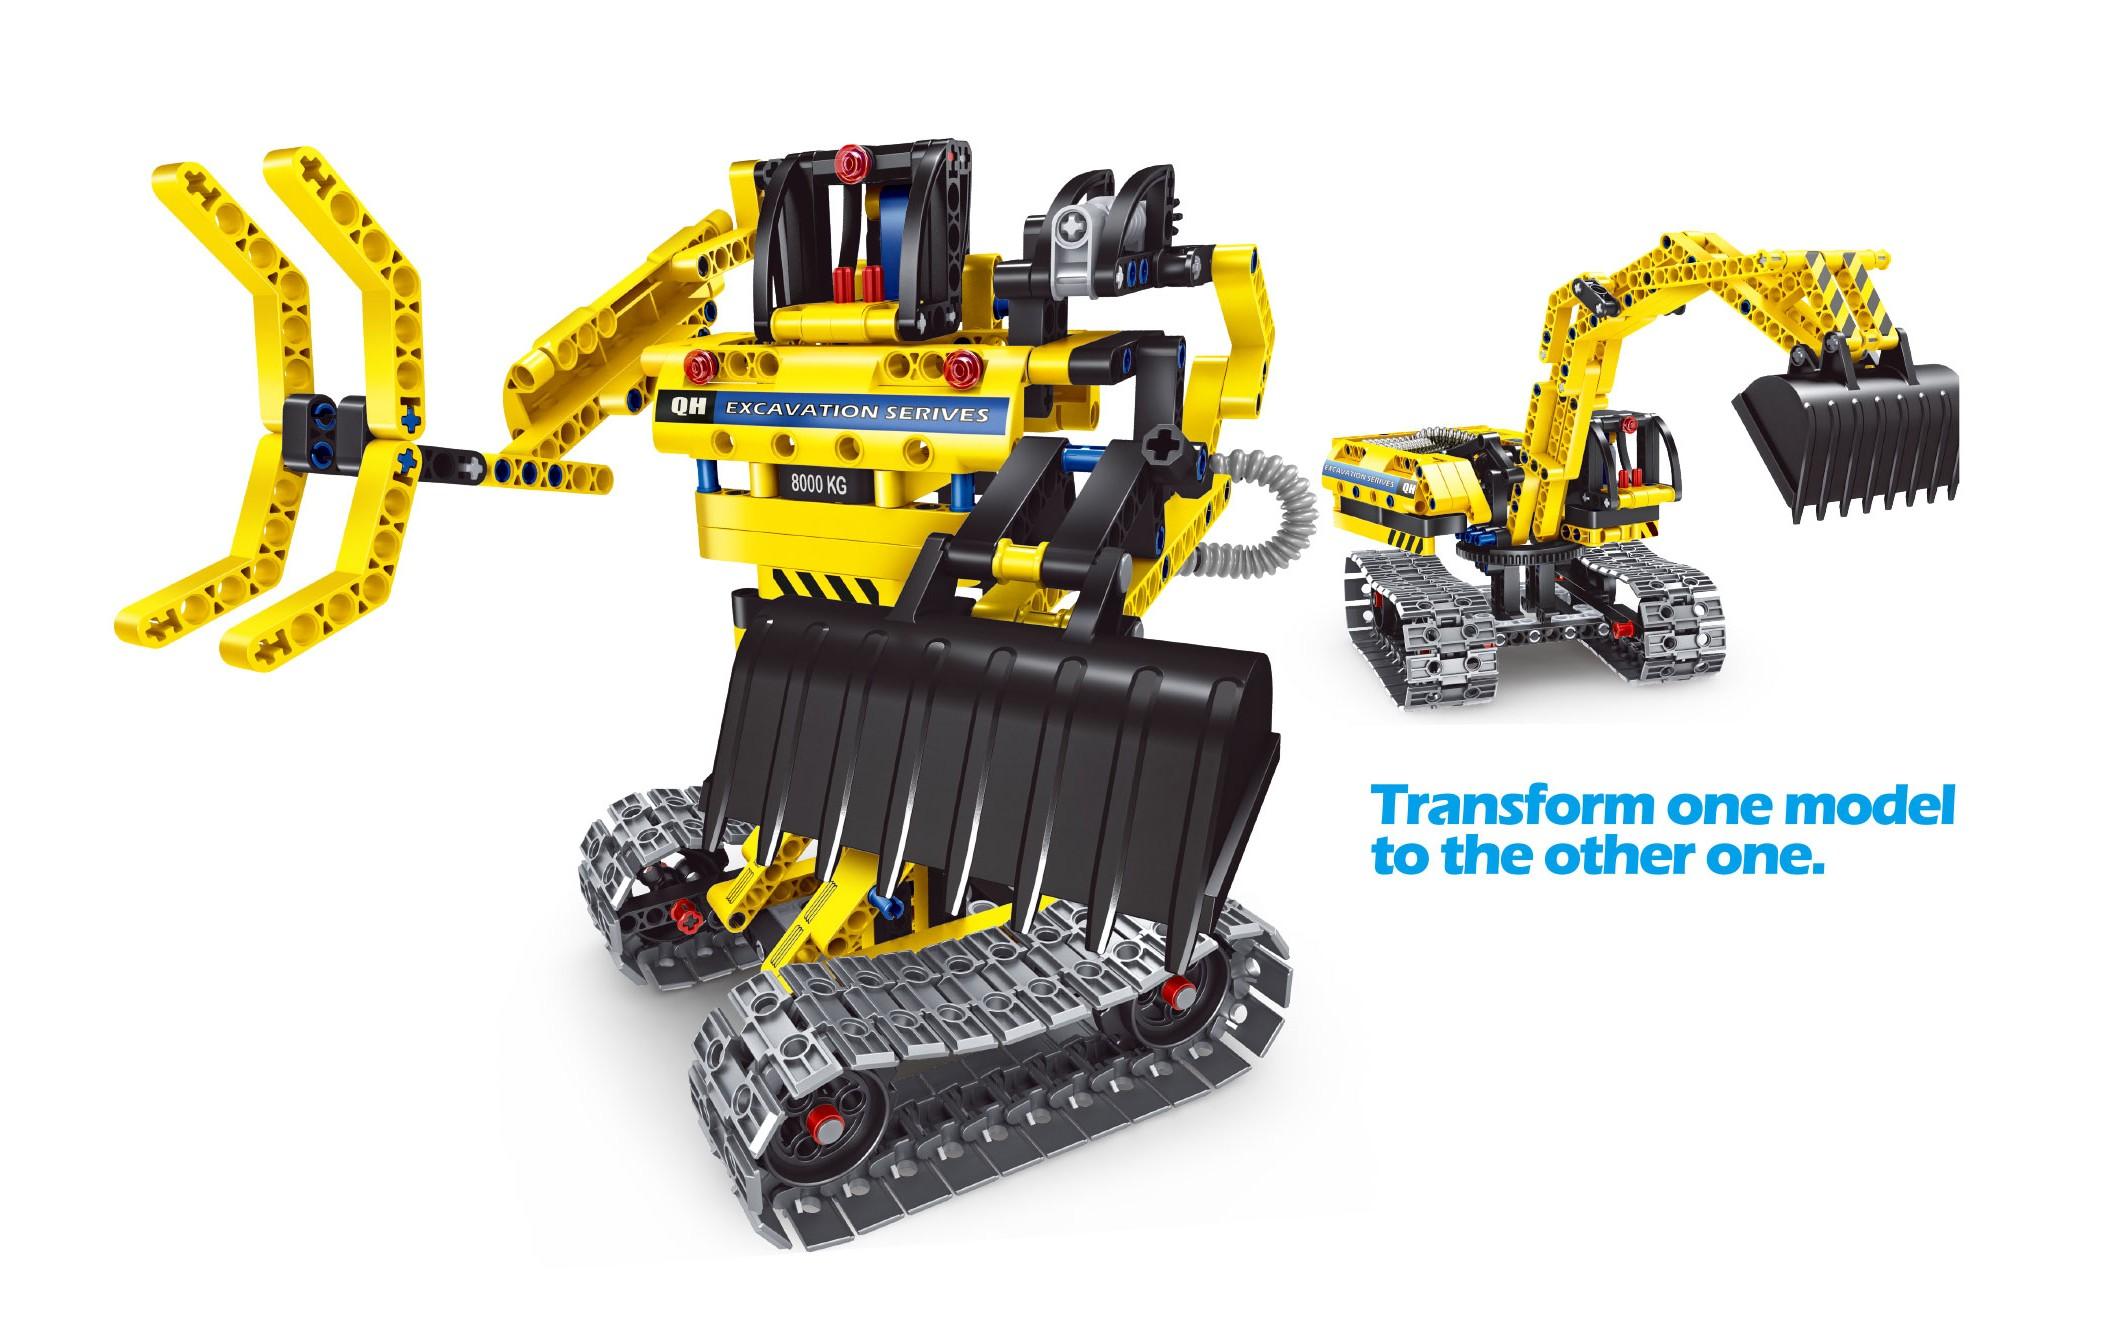 Building Blocks Bricks Construction Truck Kit STEM Toy (Excavator), 301pcs